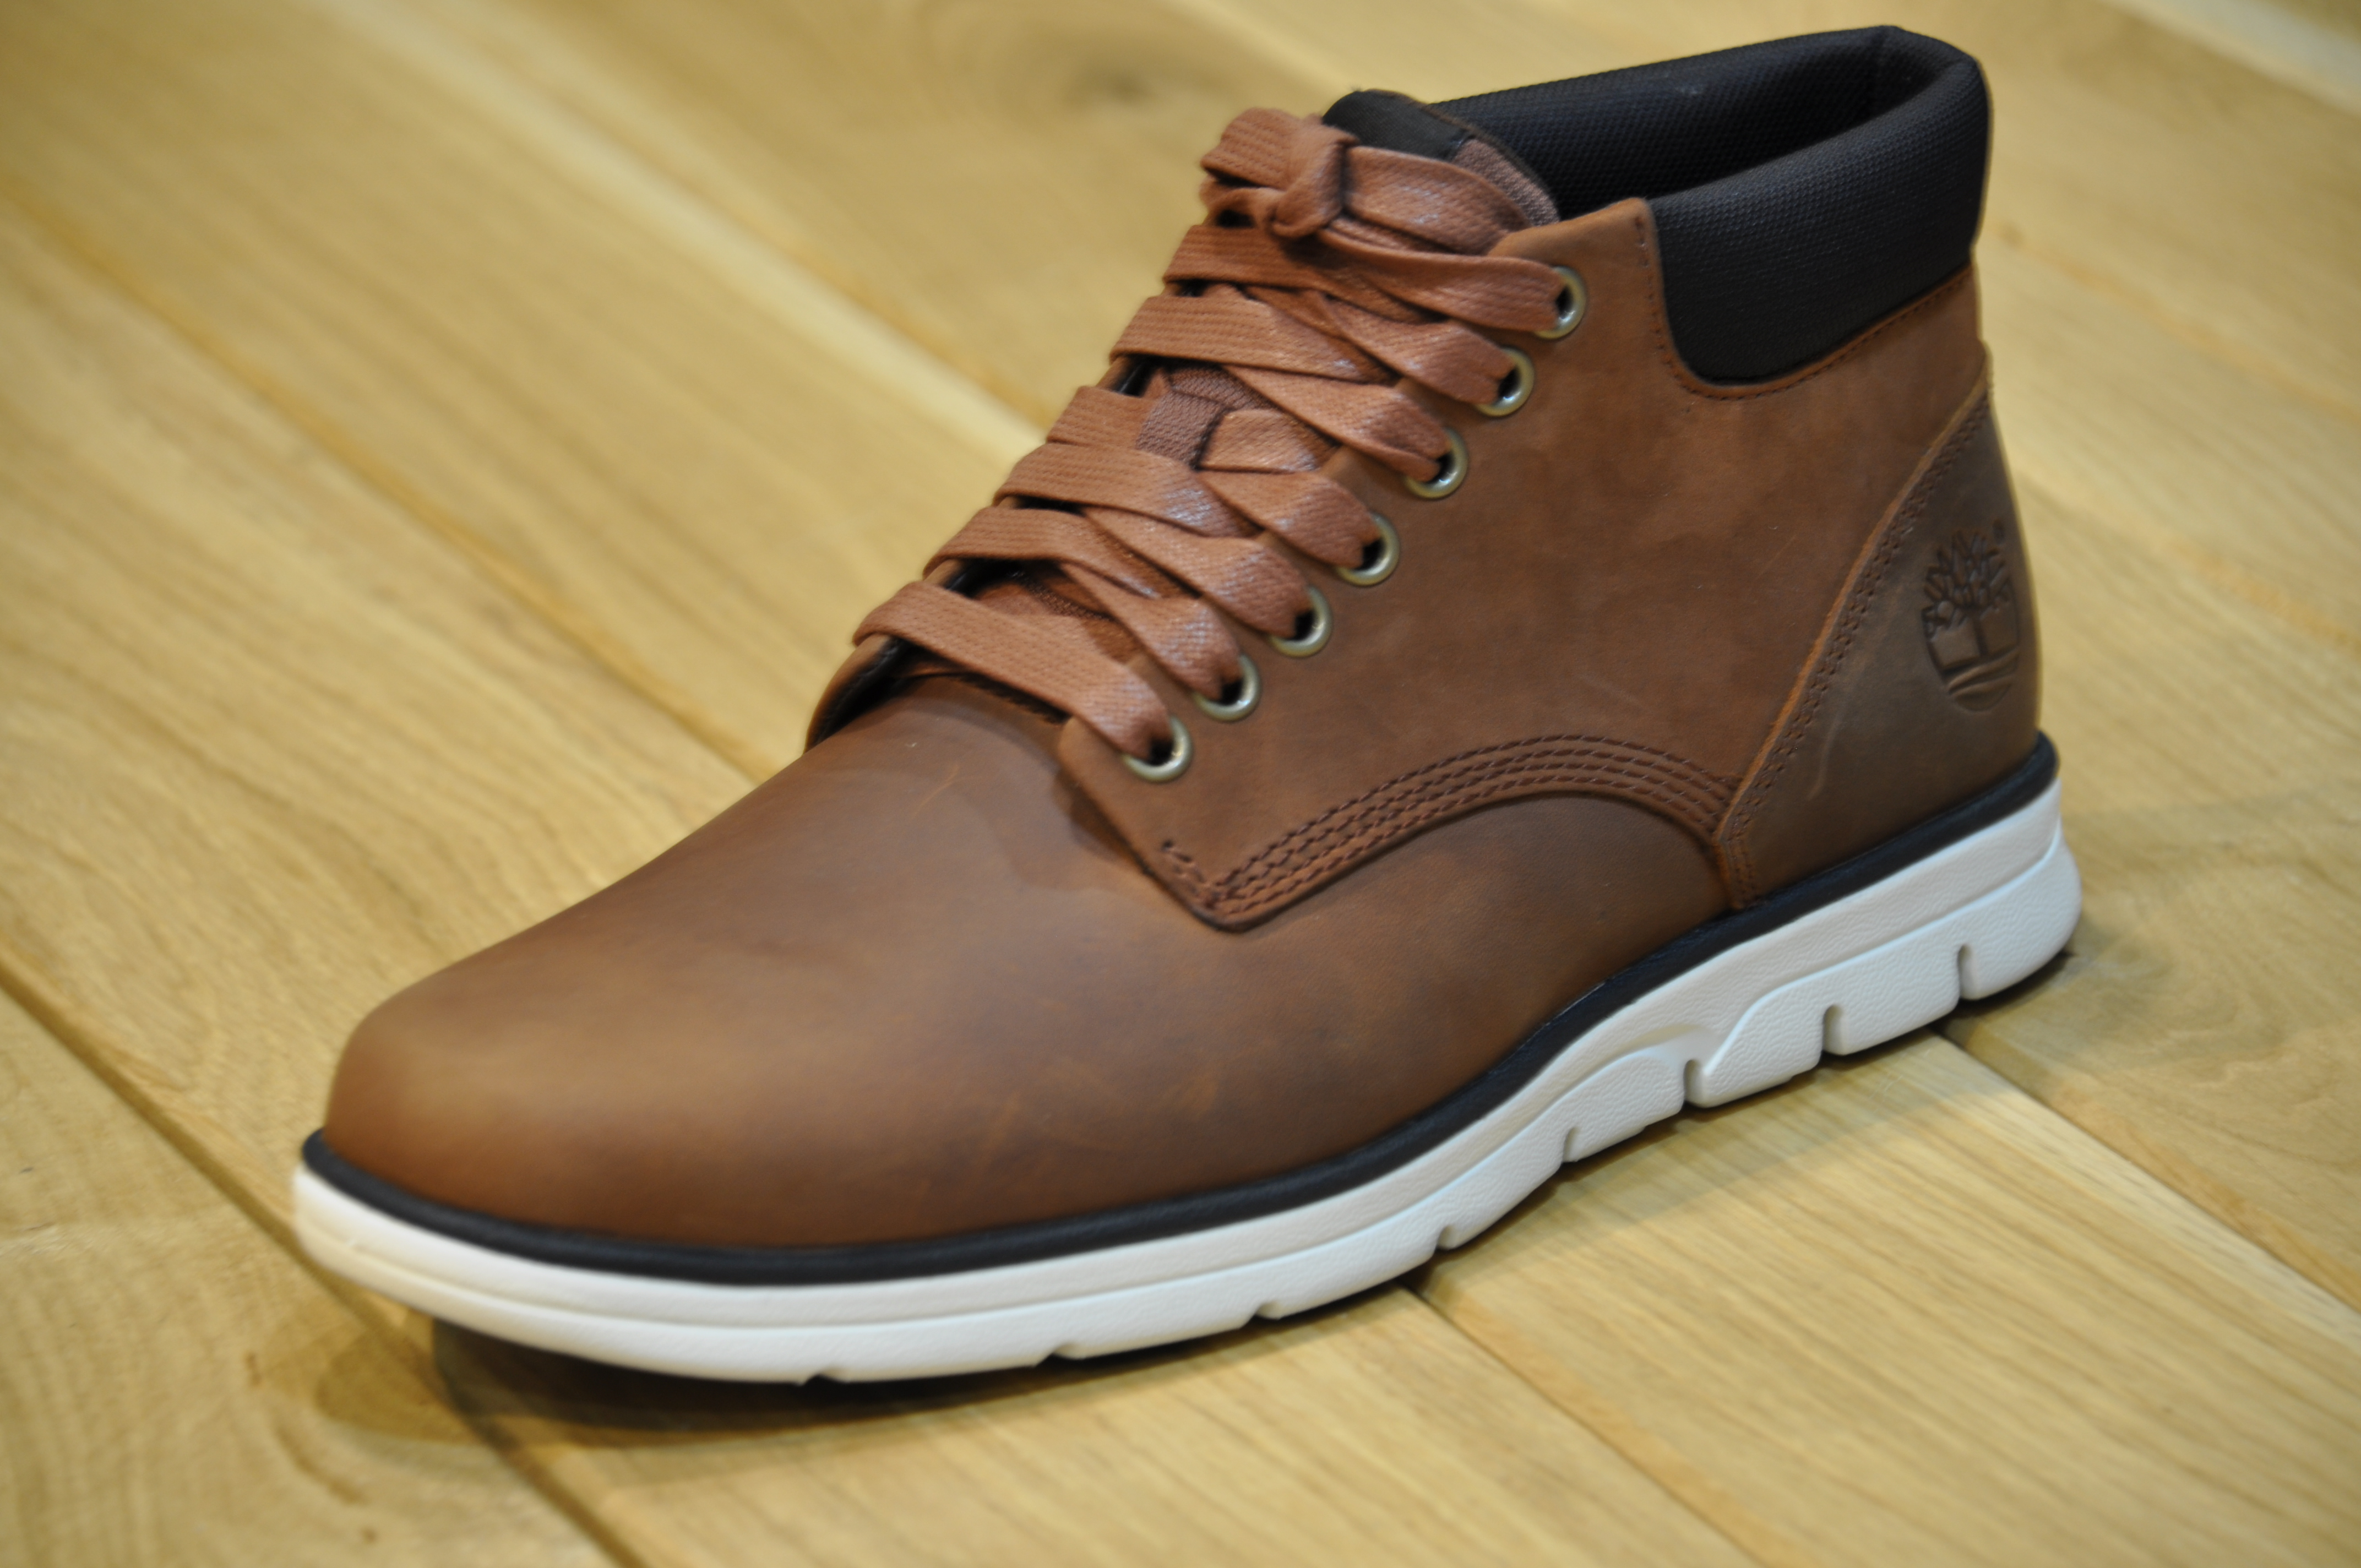 Chaussures Timberland Bradstreet Chukka — Experience Conseil c107b7c27b81